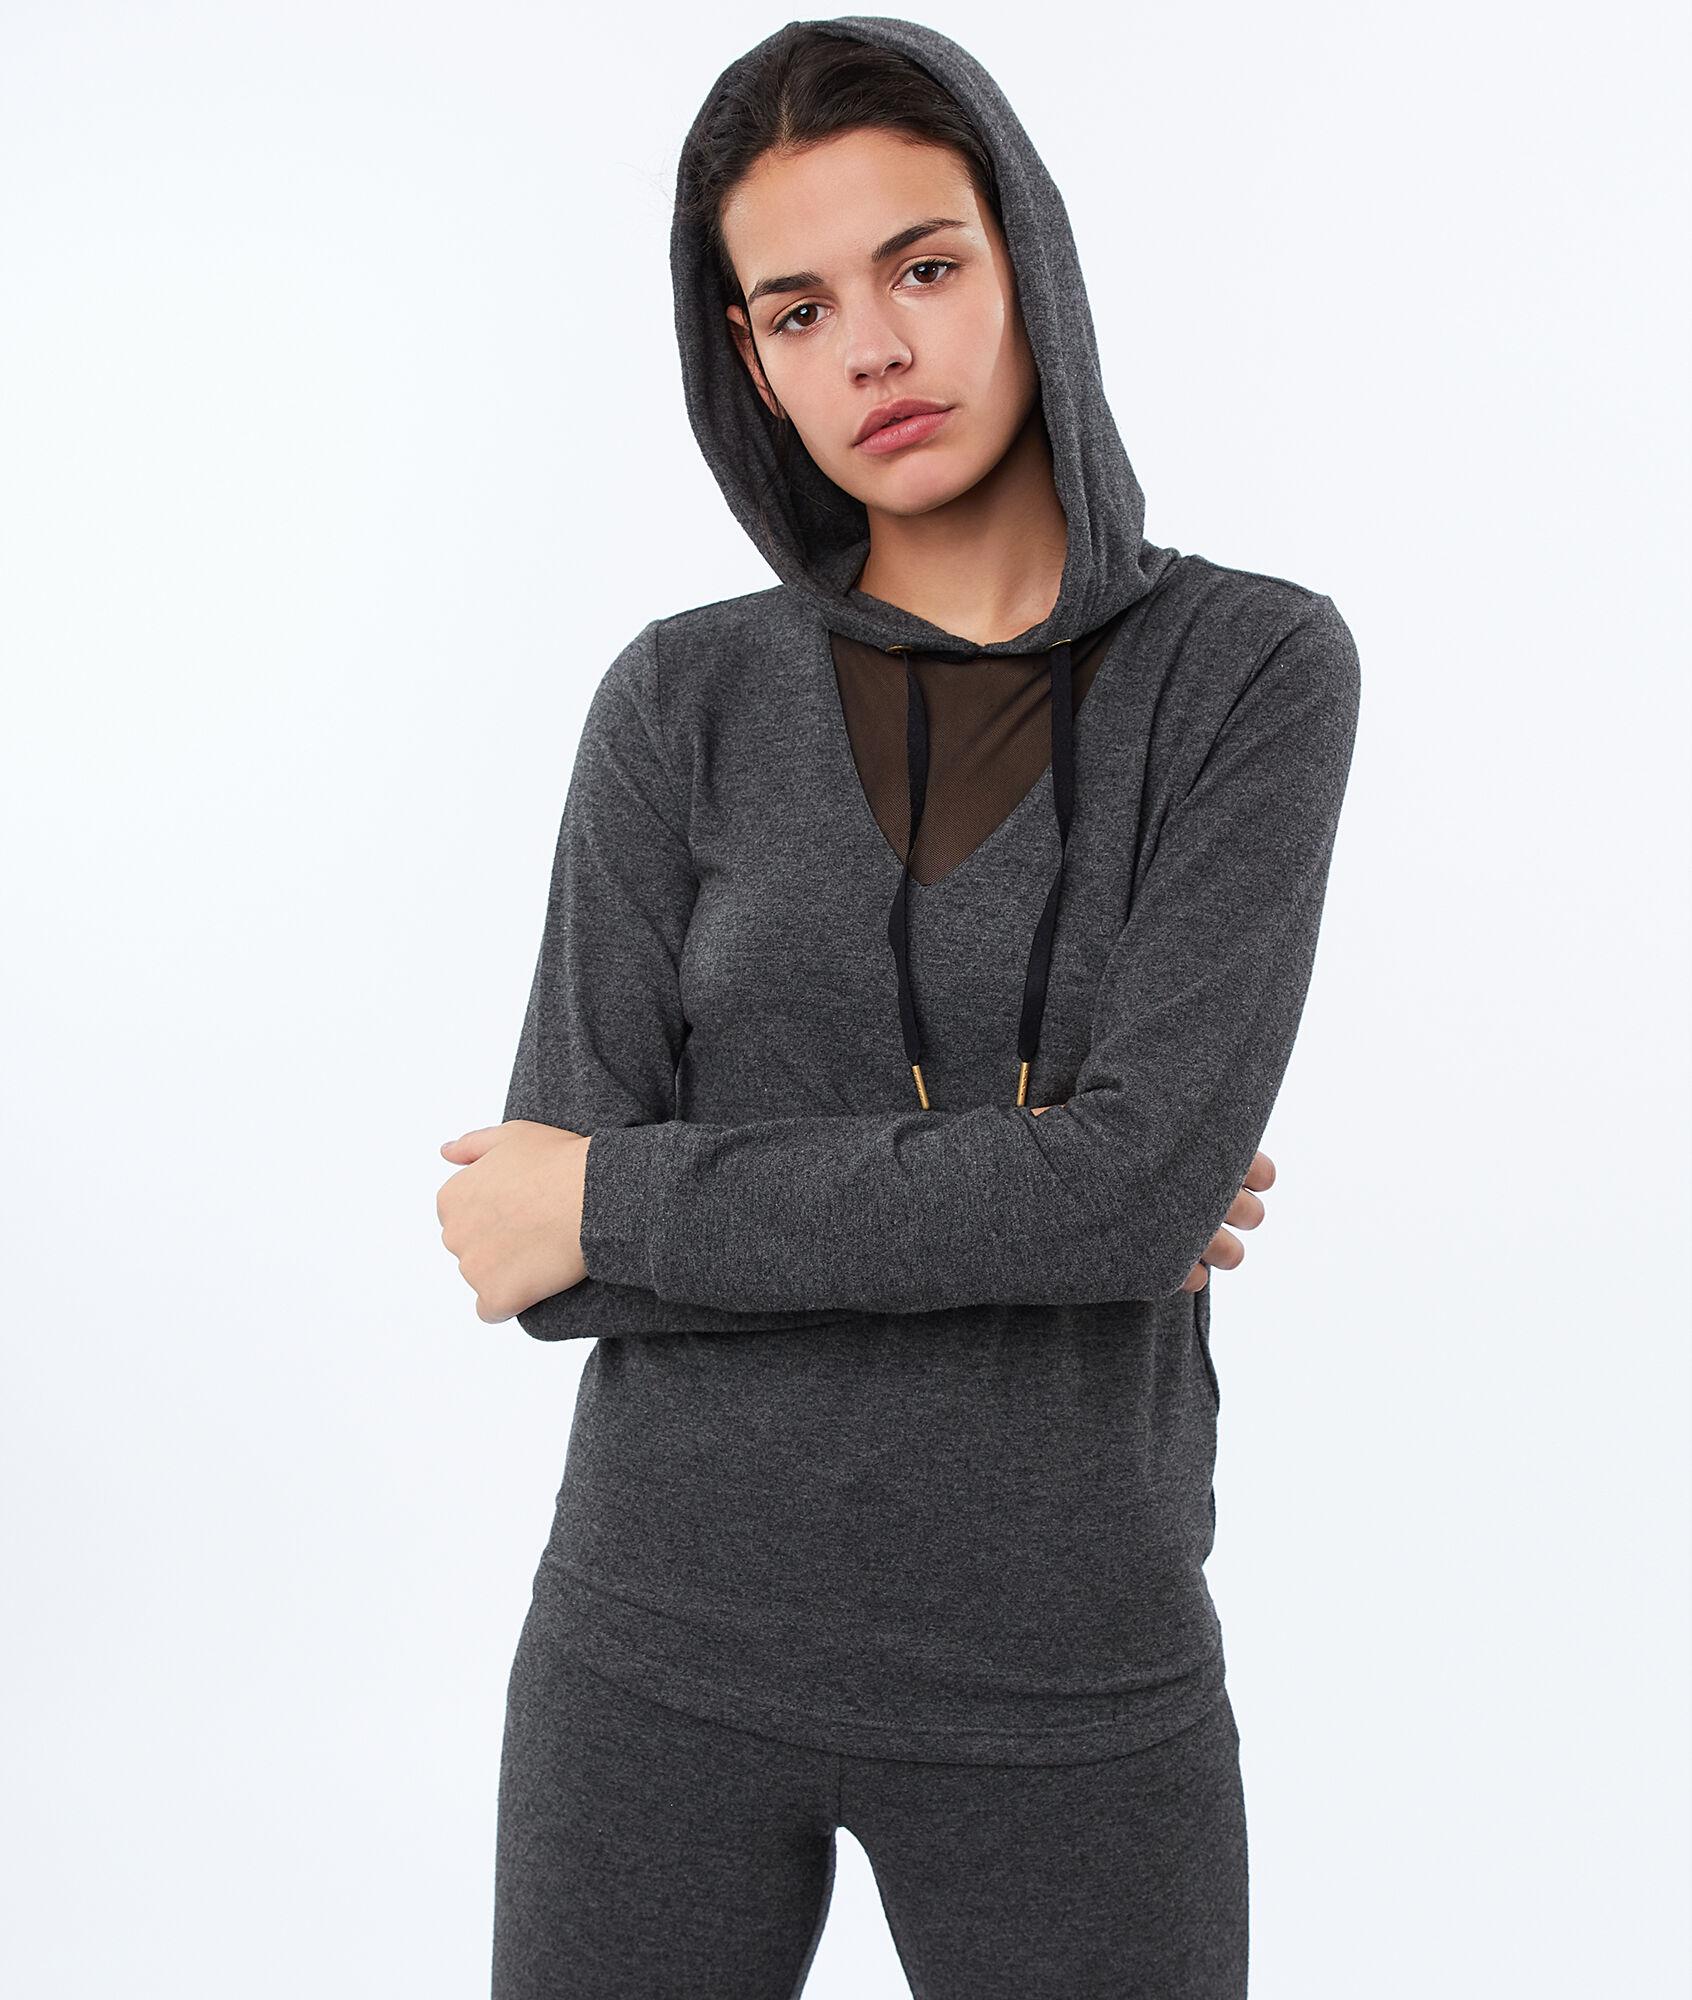 a199e77f332cd6 Homewear hooded top and fishnet neckline - Etam